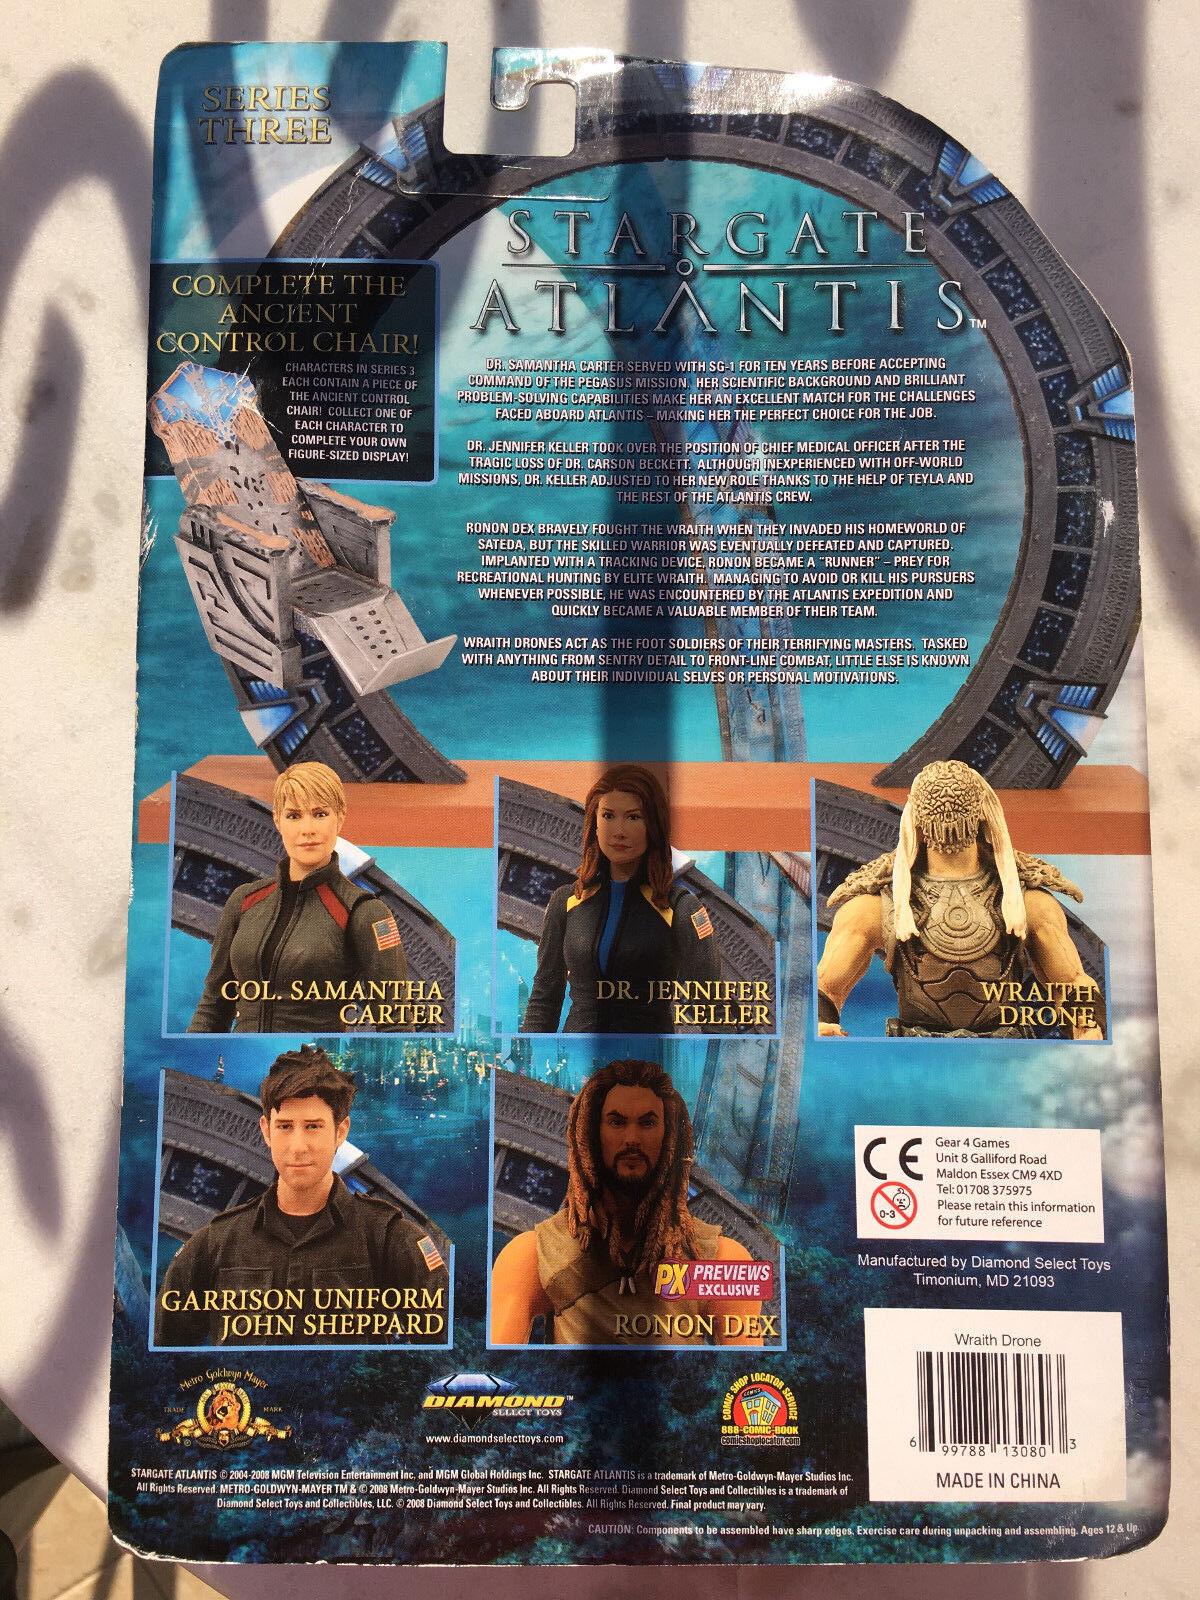 Stargate Stargate Stargate Atlantis Series 3 Wraith Drone 26a2ba